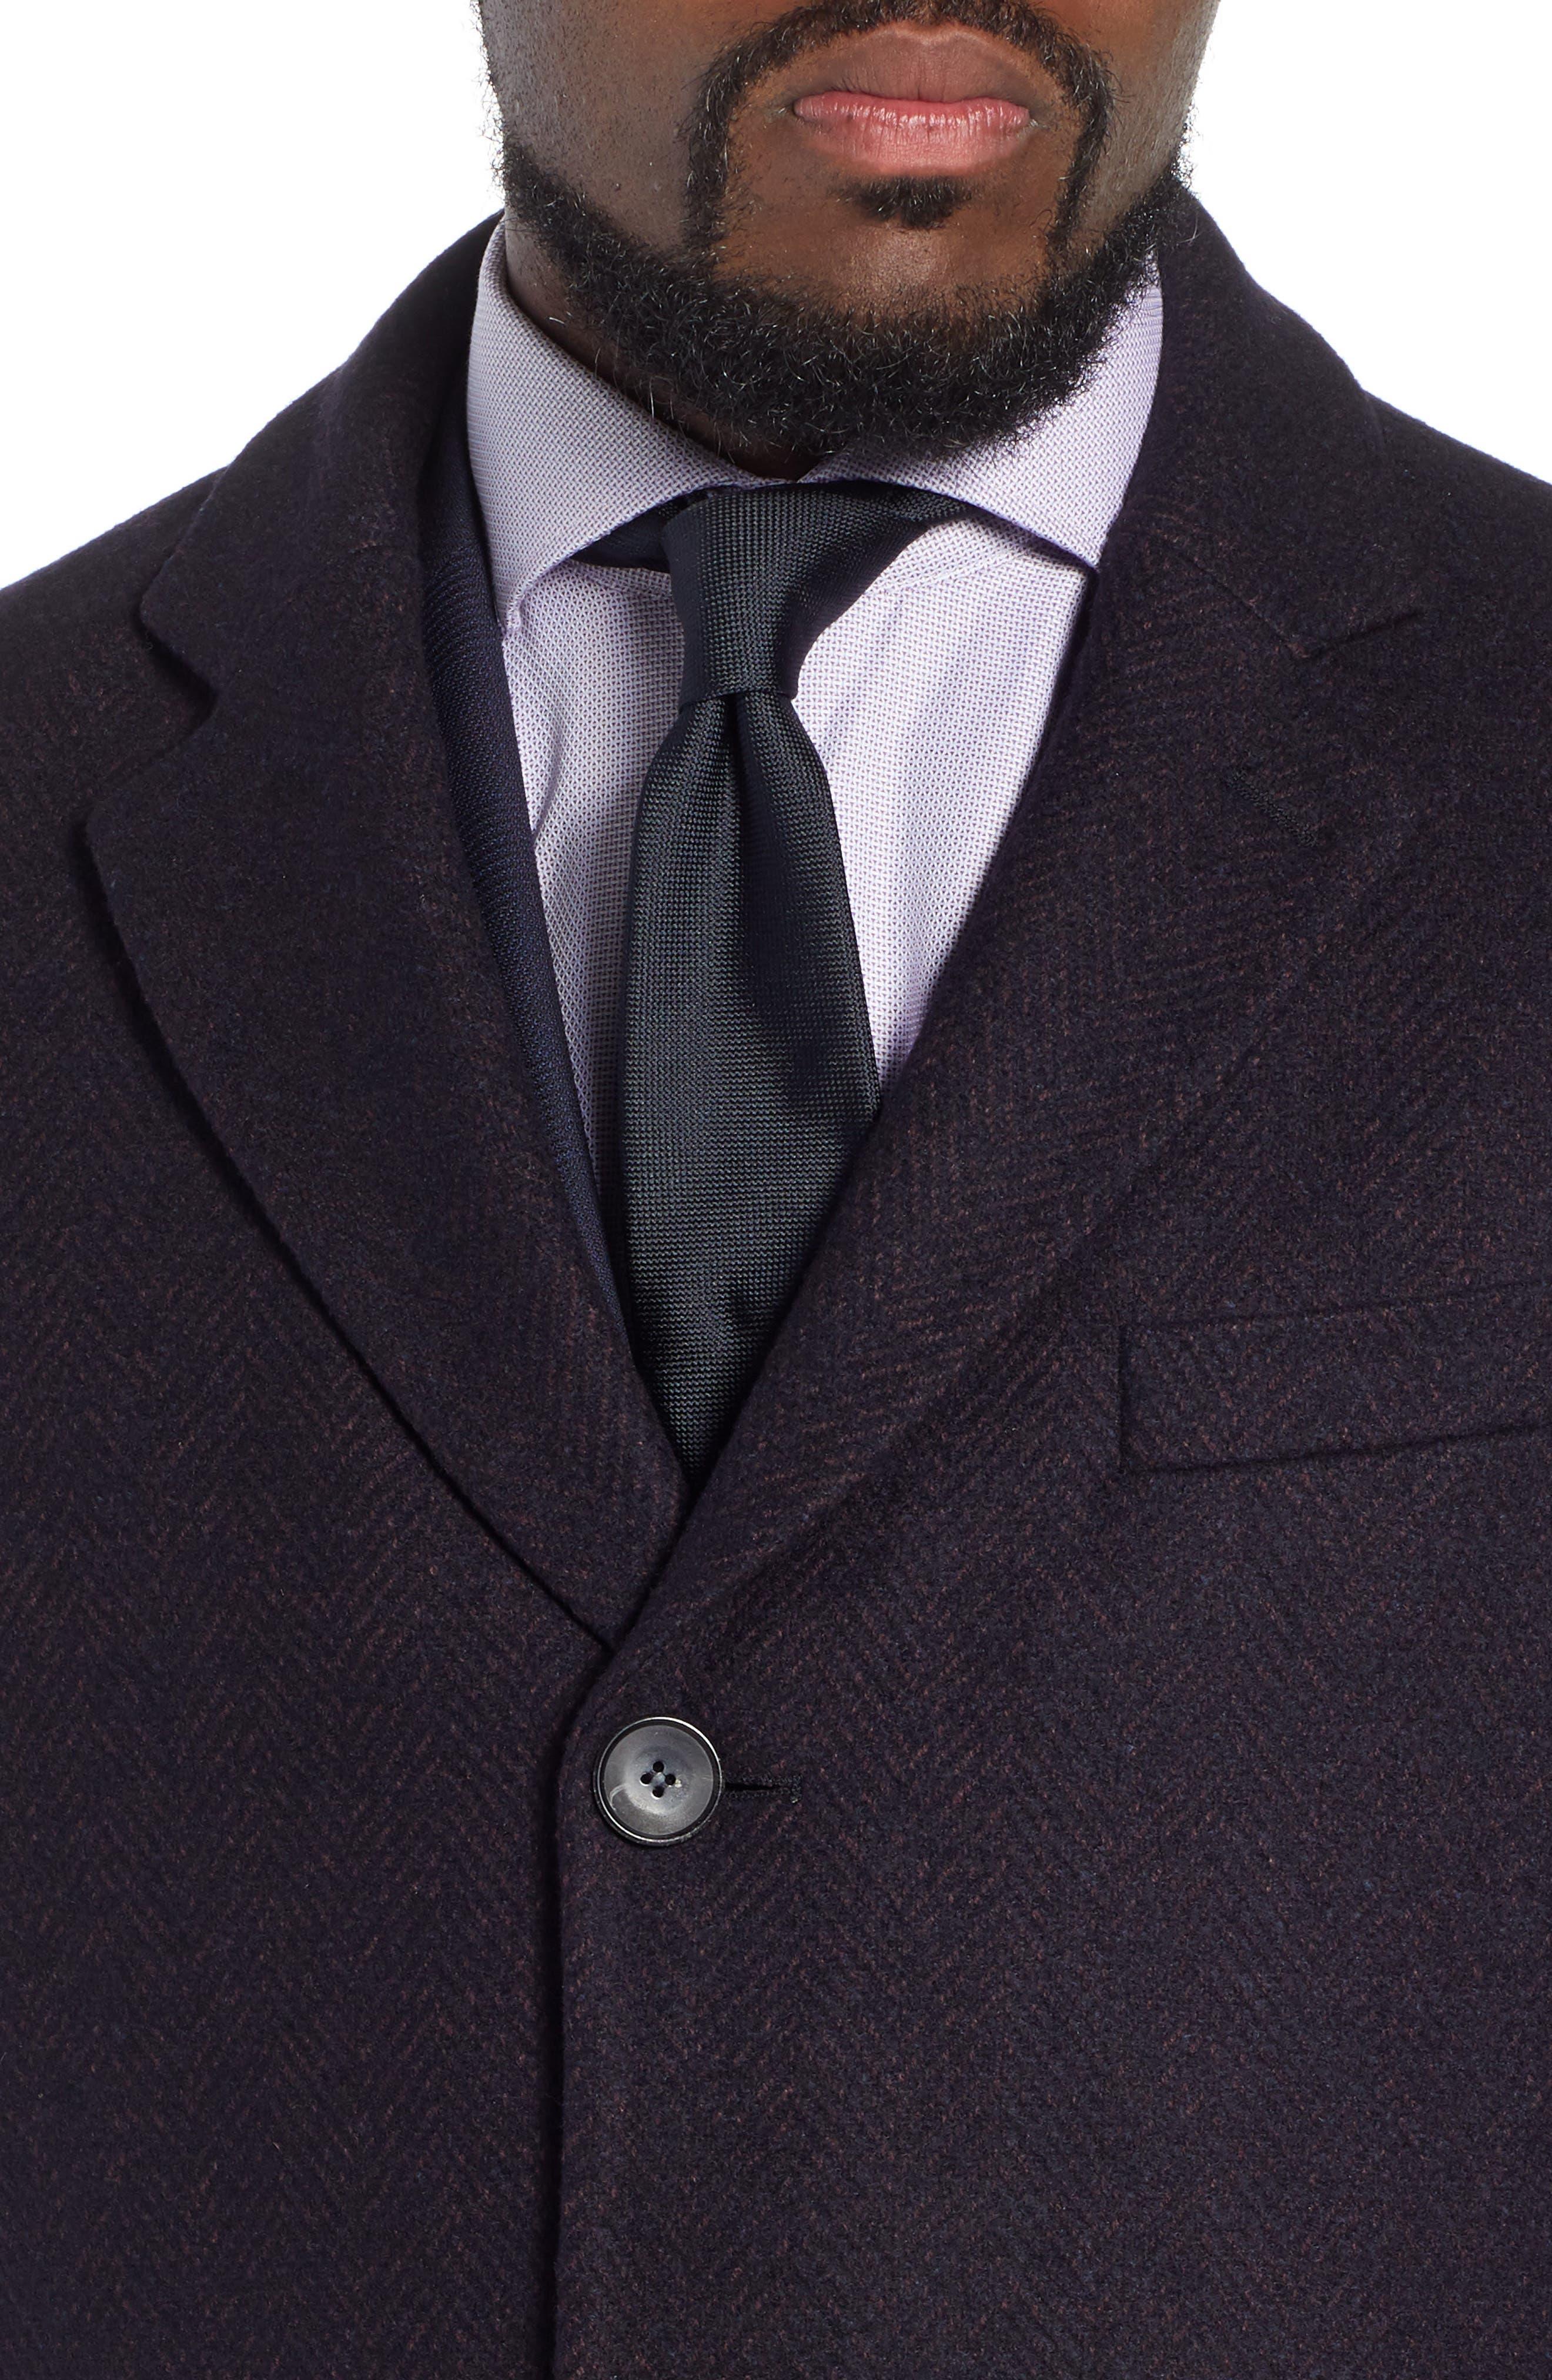 x Nordstrom Nye Wool Blend Top Coat,                             Alternate thumbnail 4, color,                             DARK RED